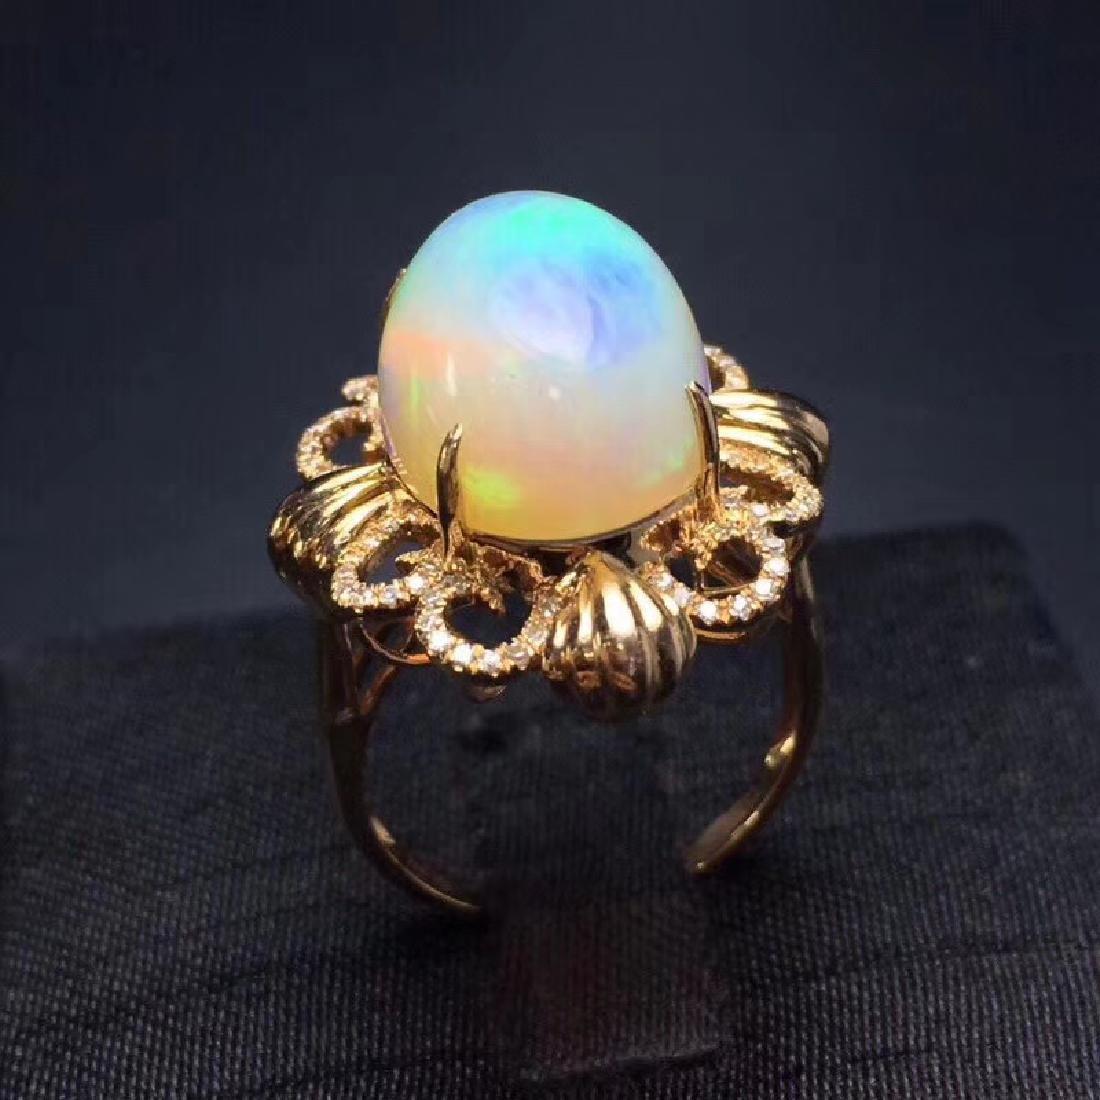 7.7 CTW Opal & VS Diamond Ring 18K - 5